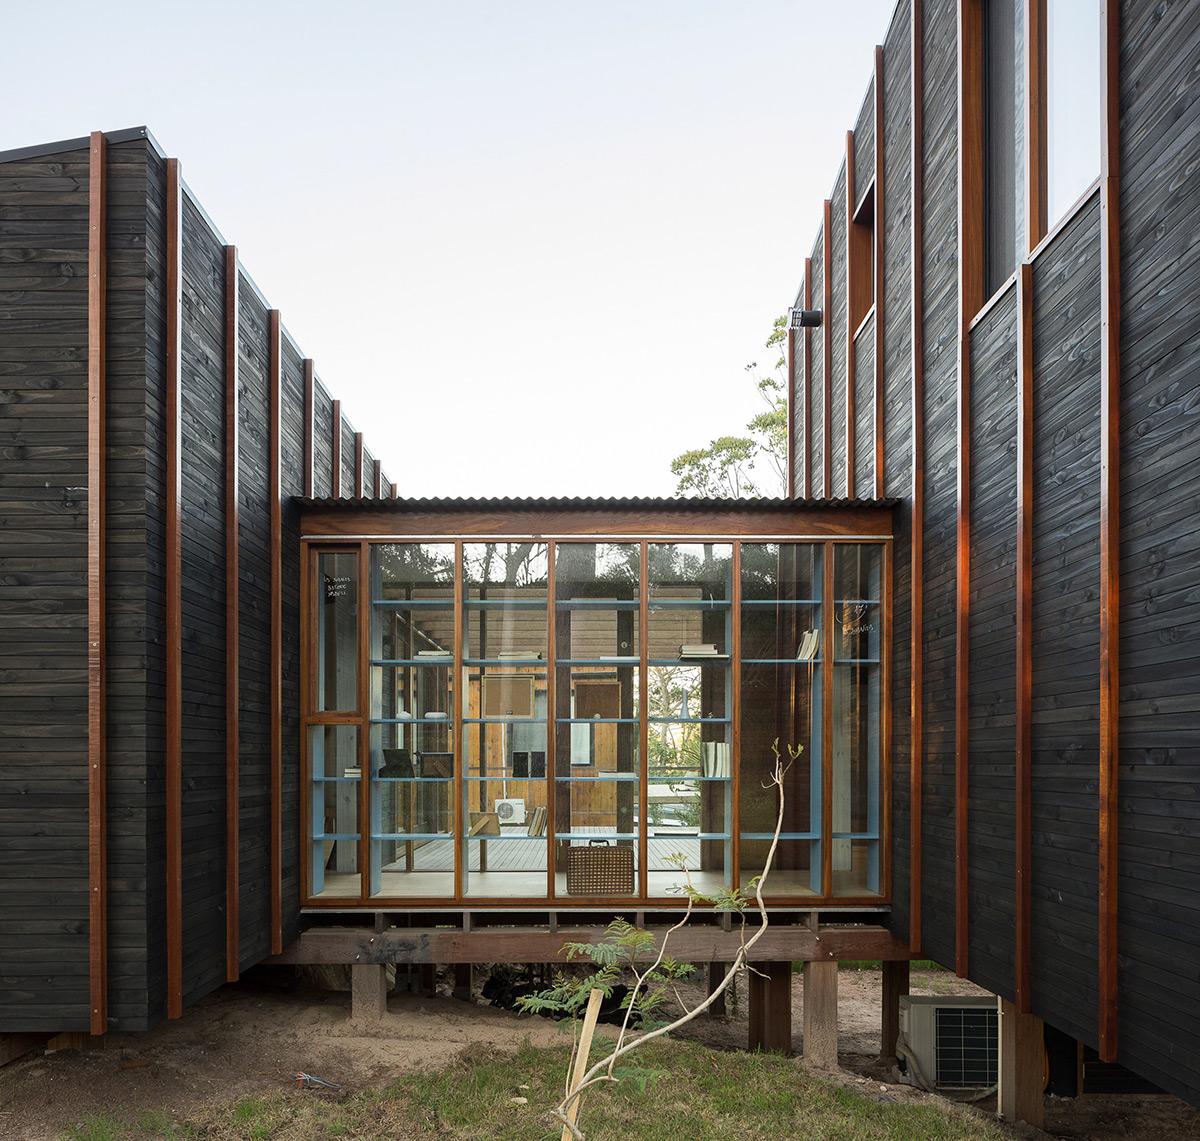 Casa-La-Juanita-FRAM-Arquitectos-Delfina-Riverti-Fernando-Schapochnik-03